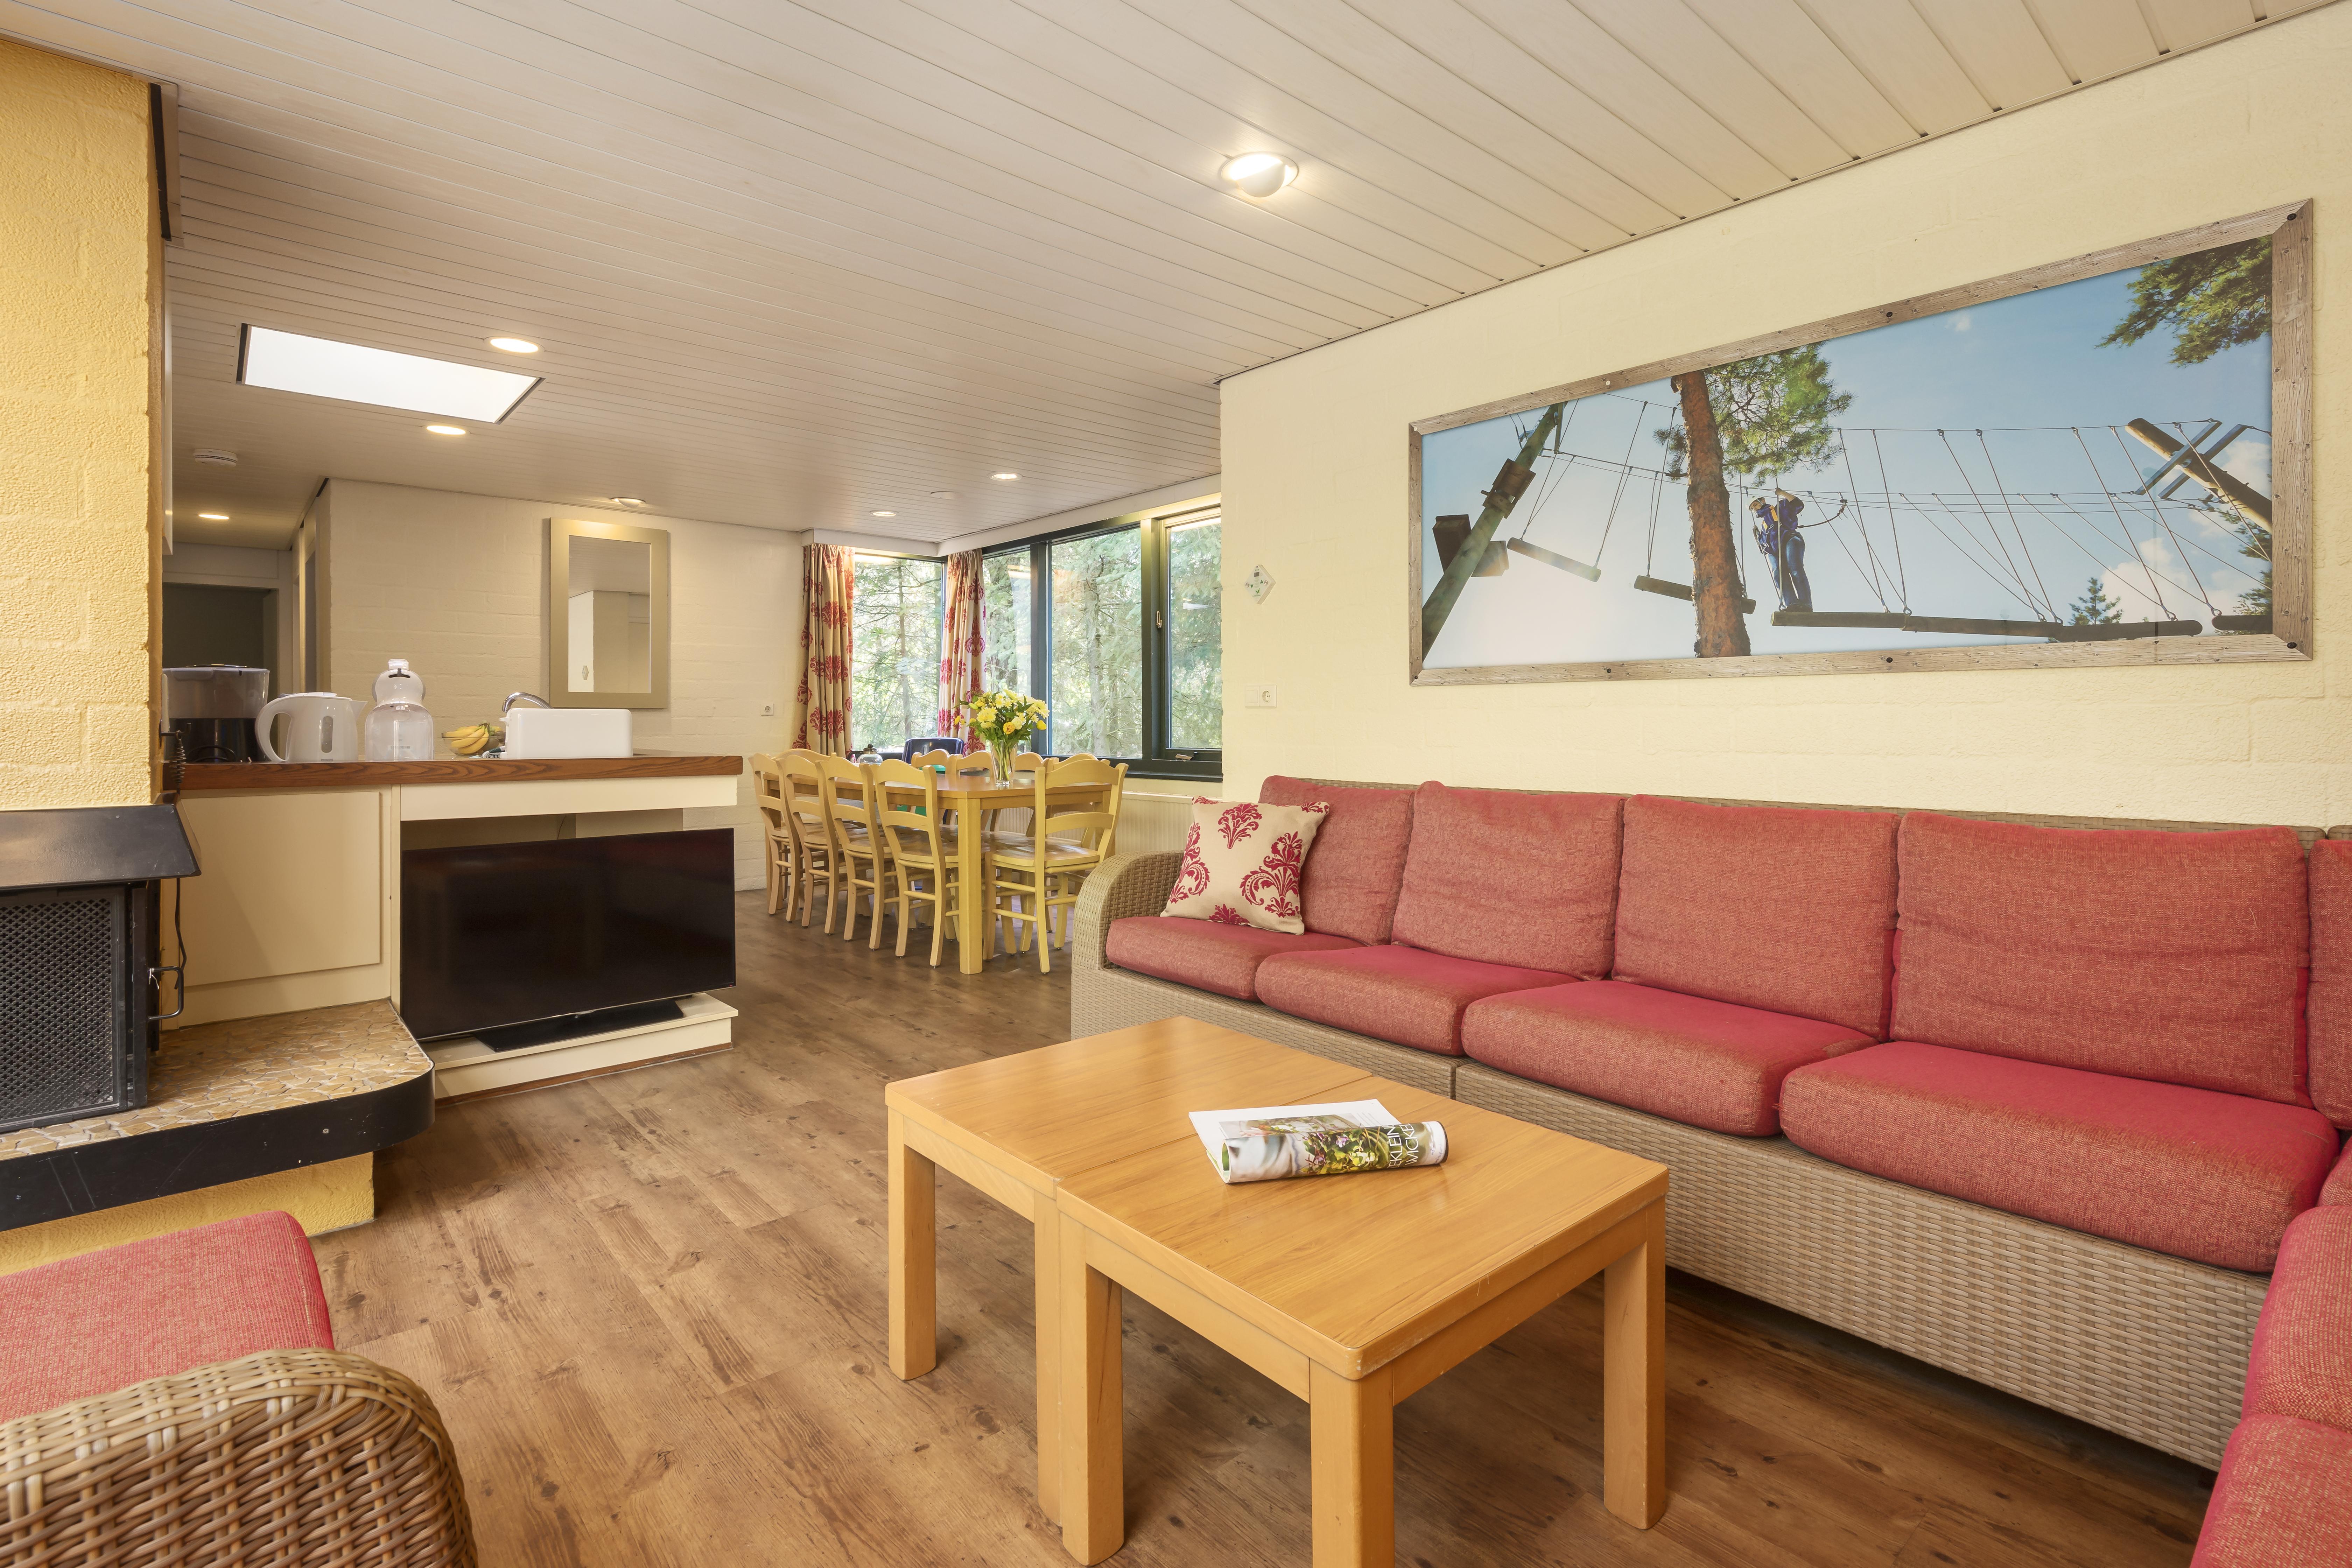 Ferienhaus Center Parcs De Kempervennen - cottage Premium 10 persons (2639207), Westerhoven, , Nordbrabant, Niederlande, Bild 5